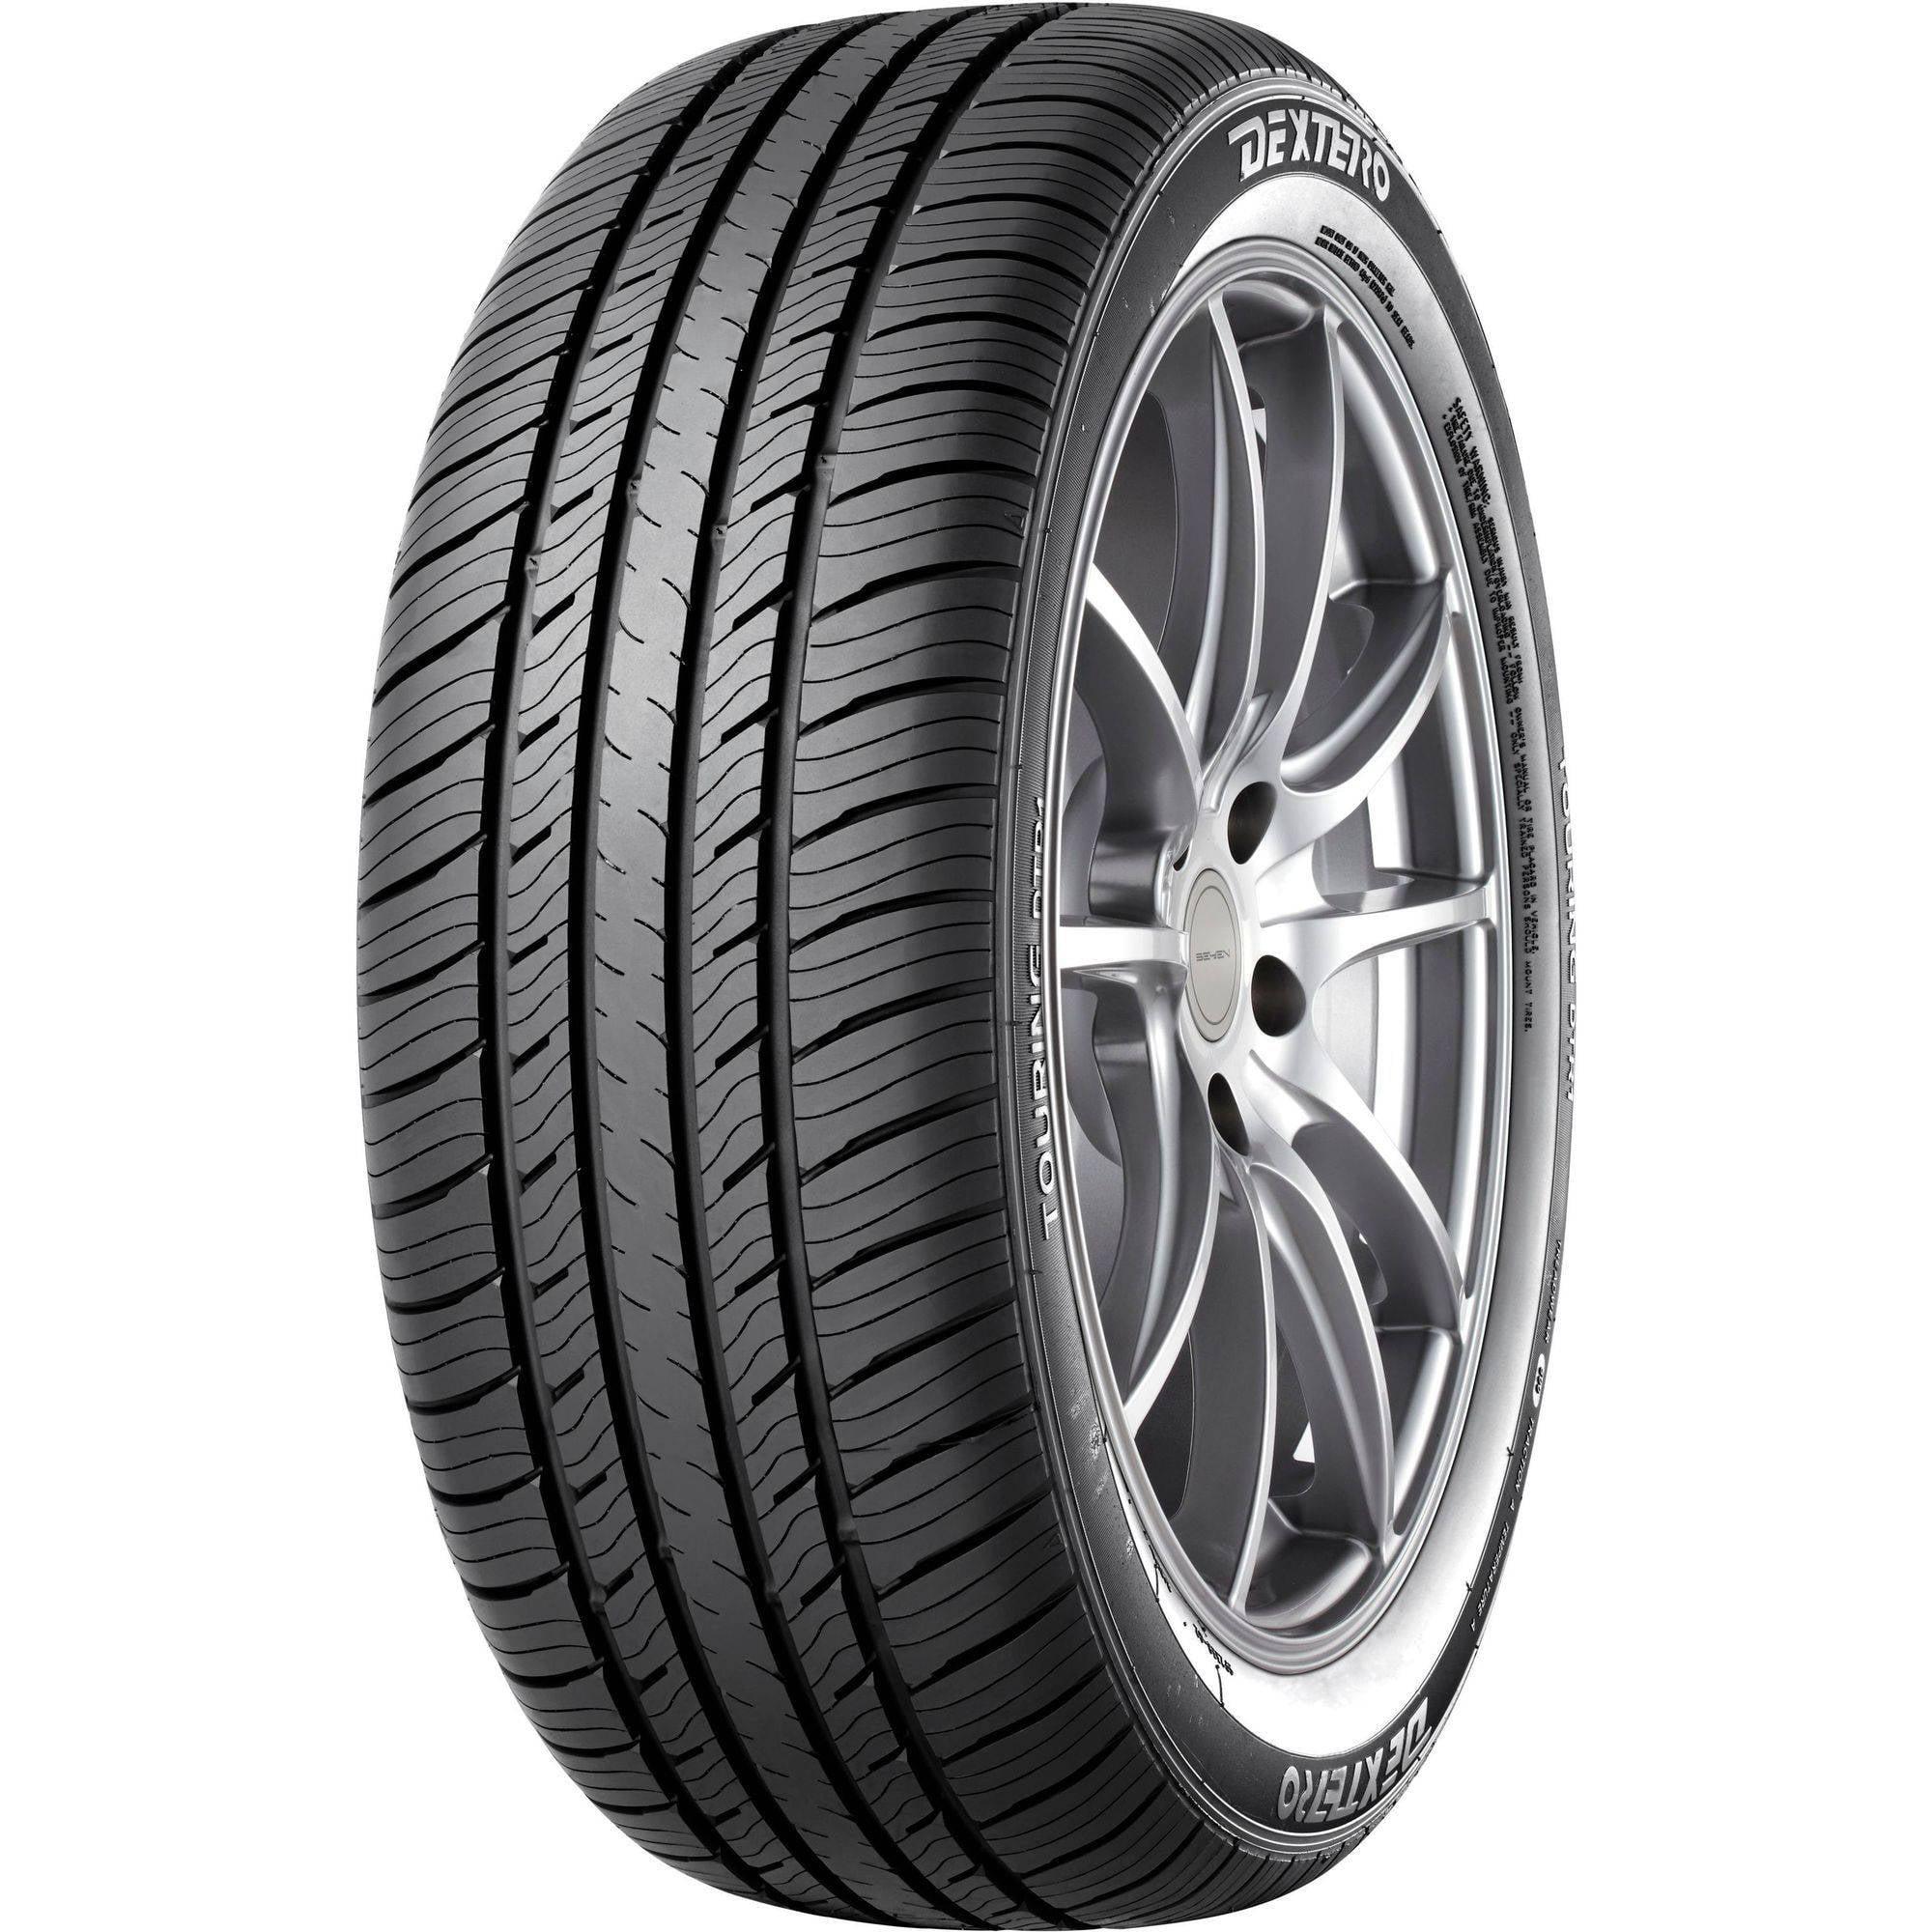 Dextero Dtr1 Touring 225 60r16 98h Tire Walmart Com